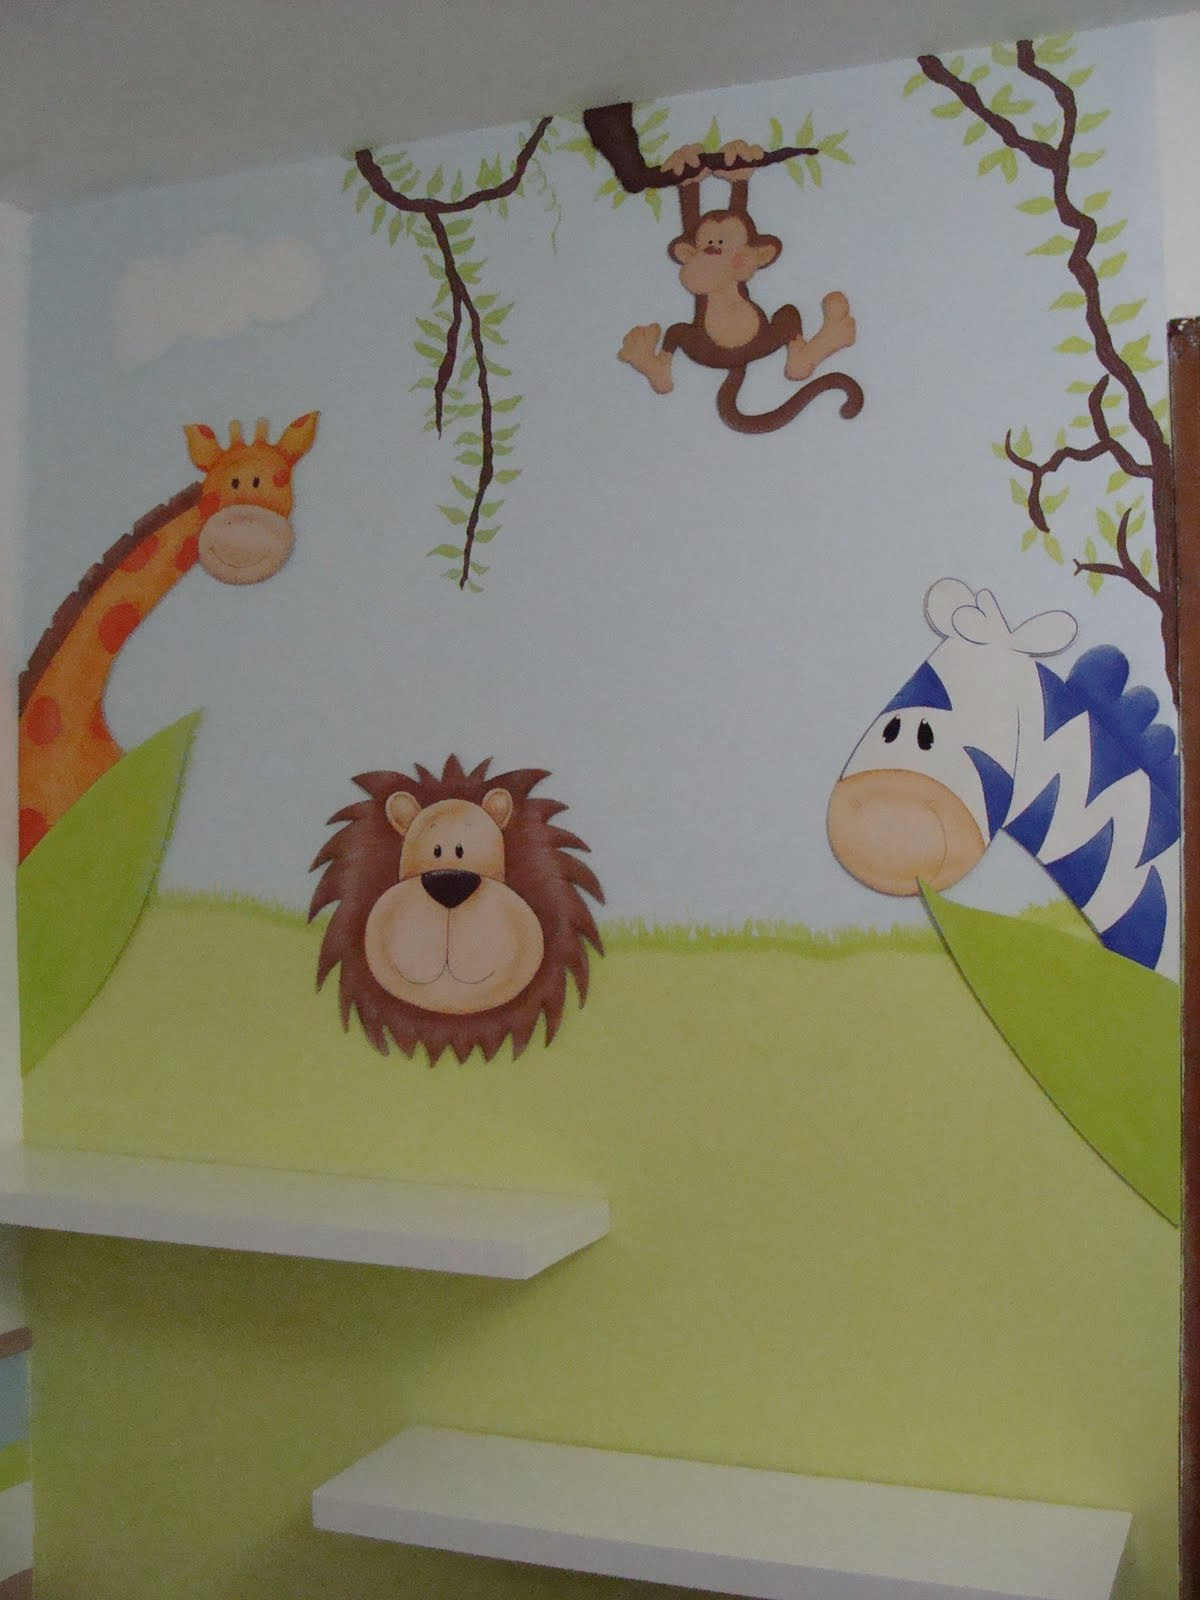 Decoración De Safari Para Bebés Imagui